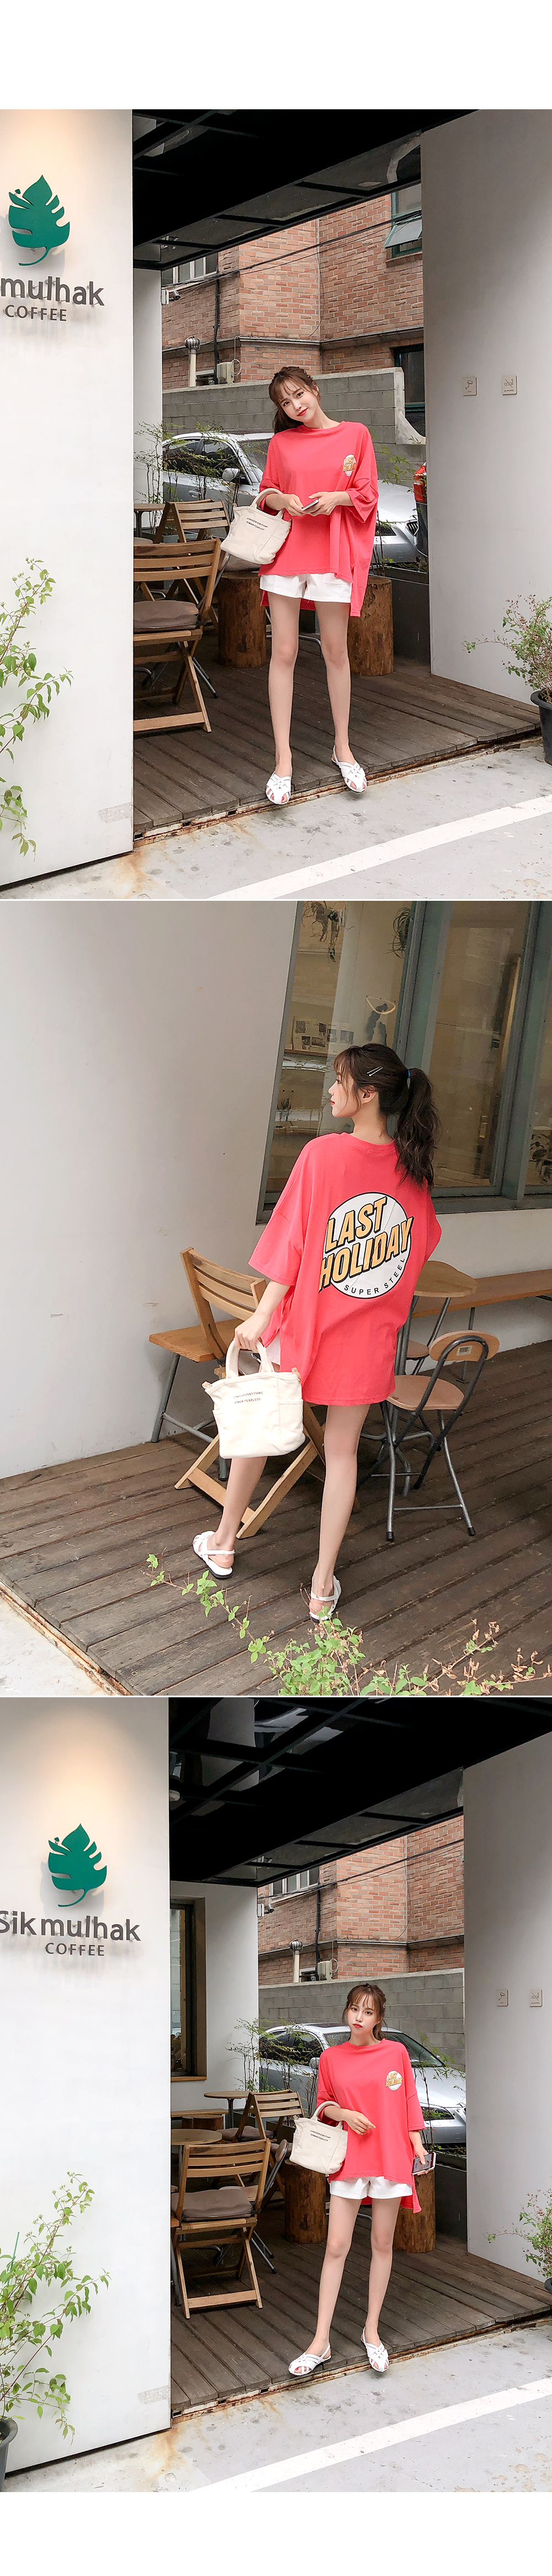 Boxy tee polo shirt